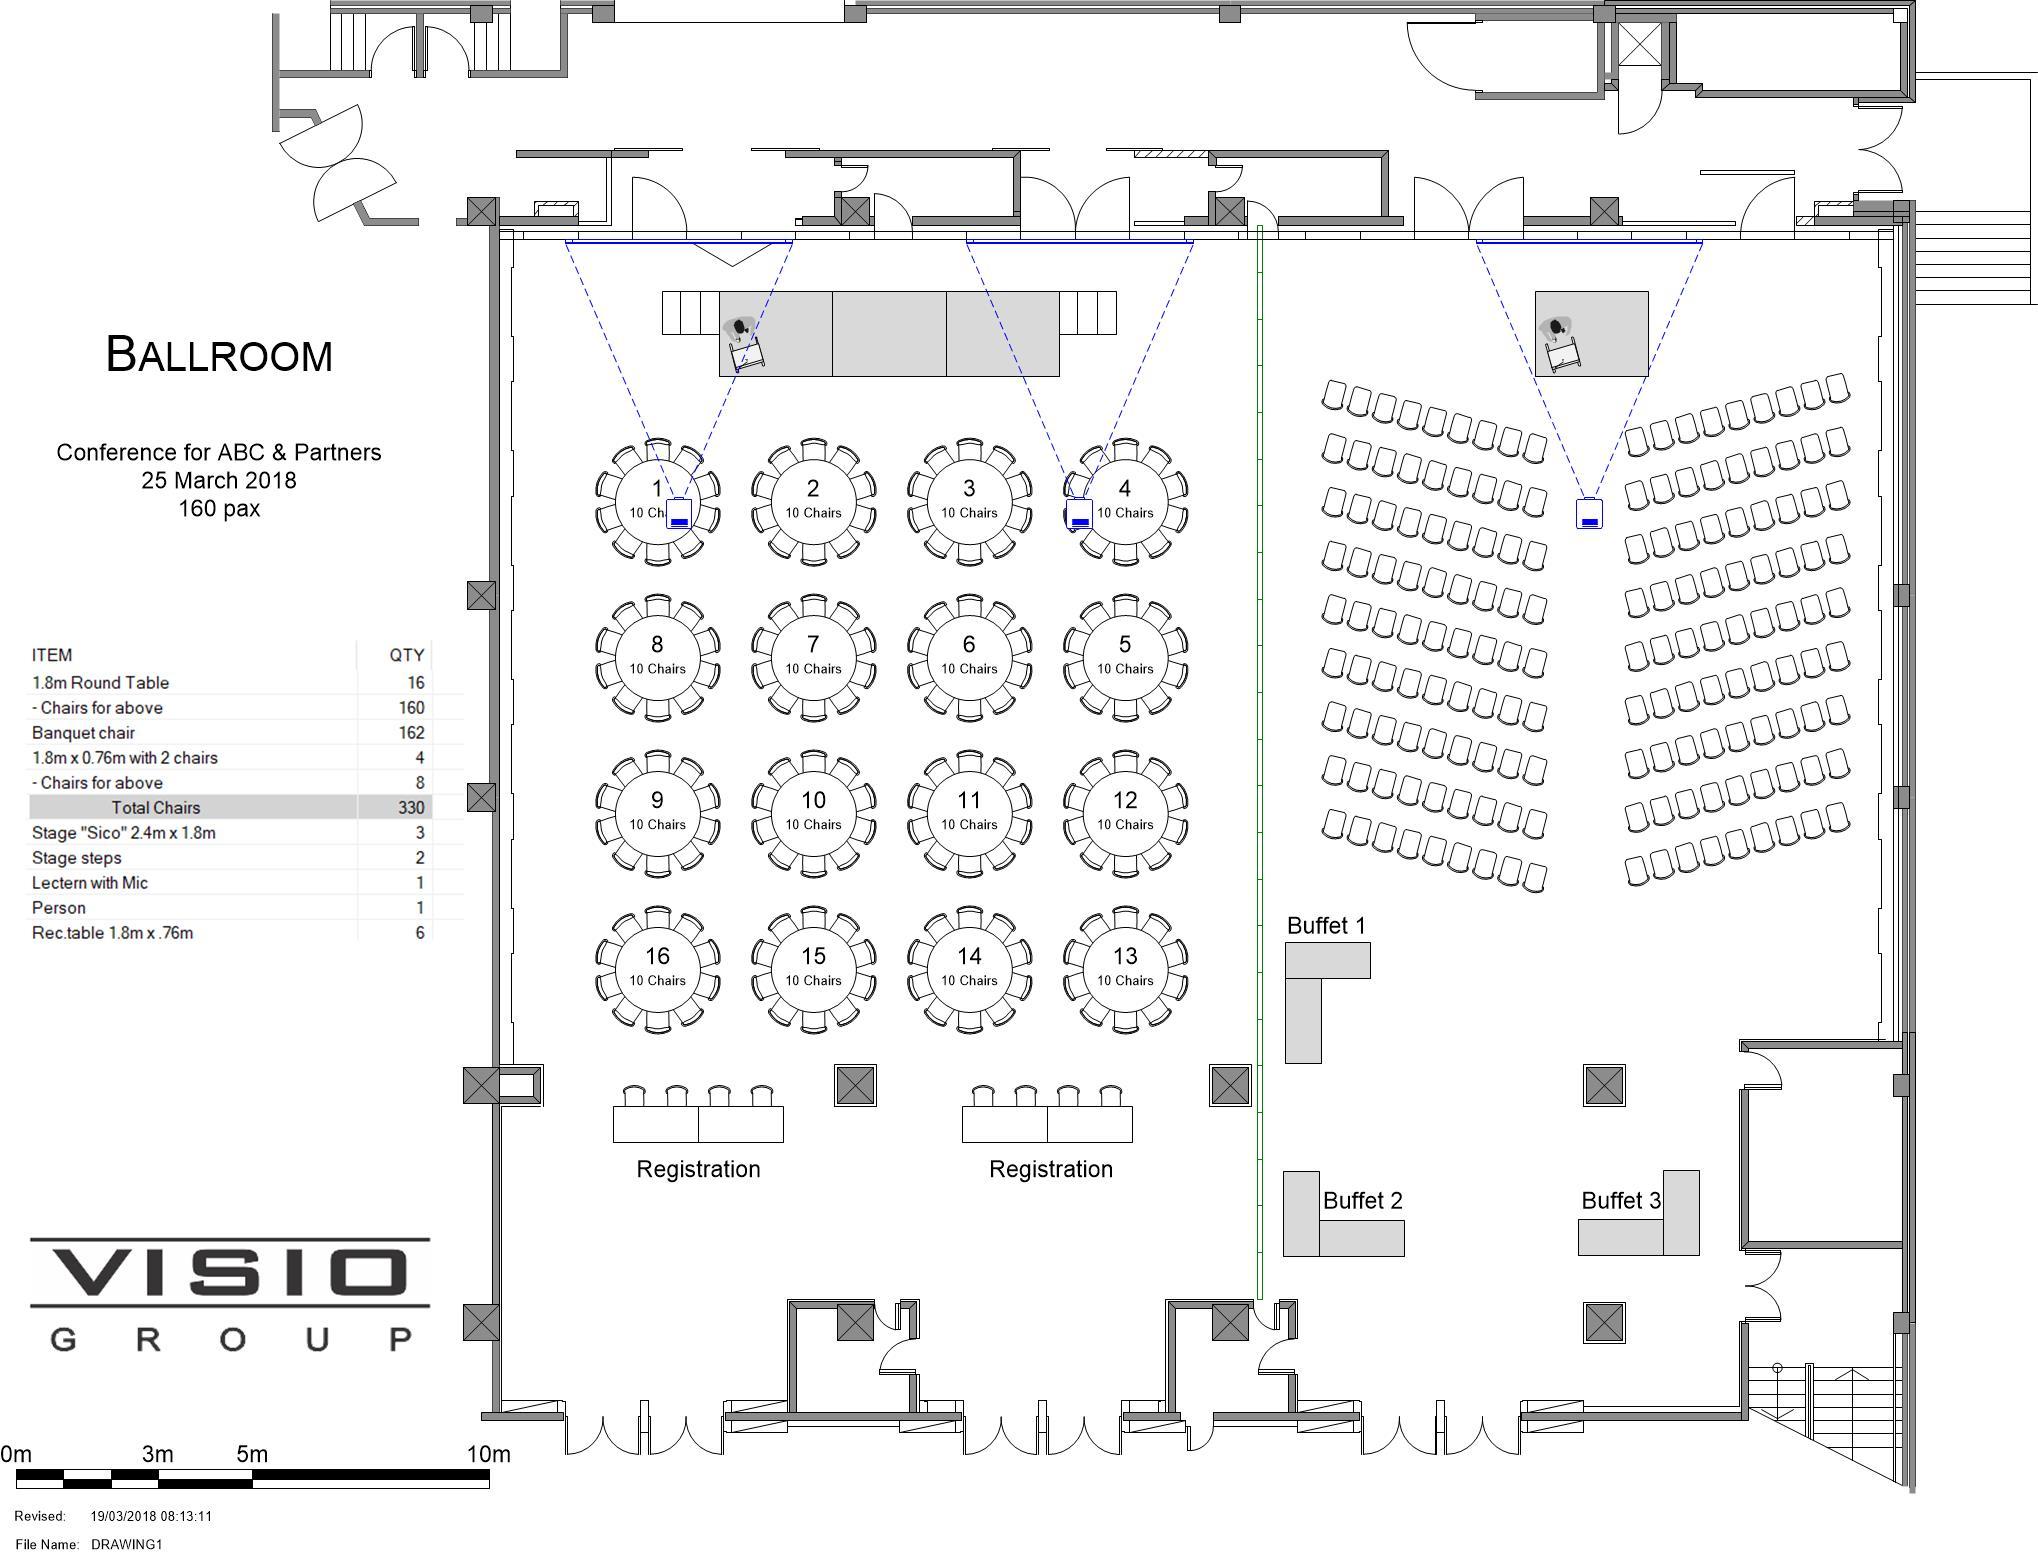 sample-floor-plan-created-in-eventdraw